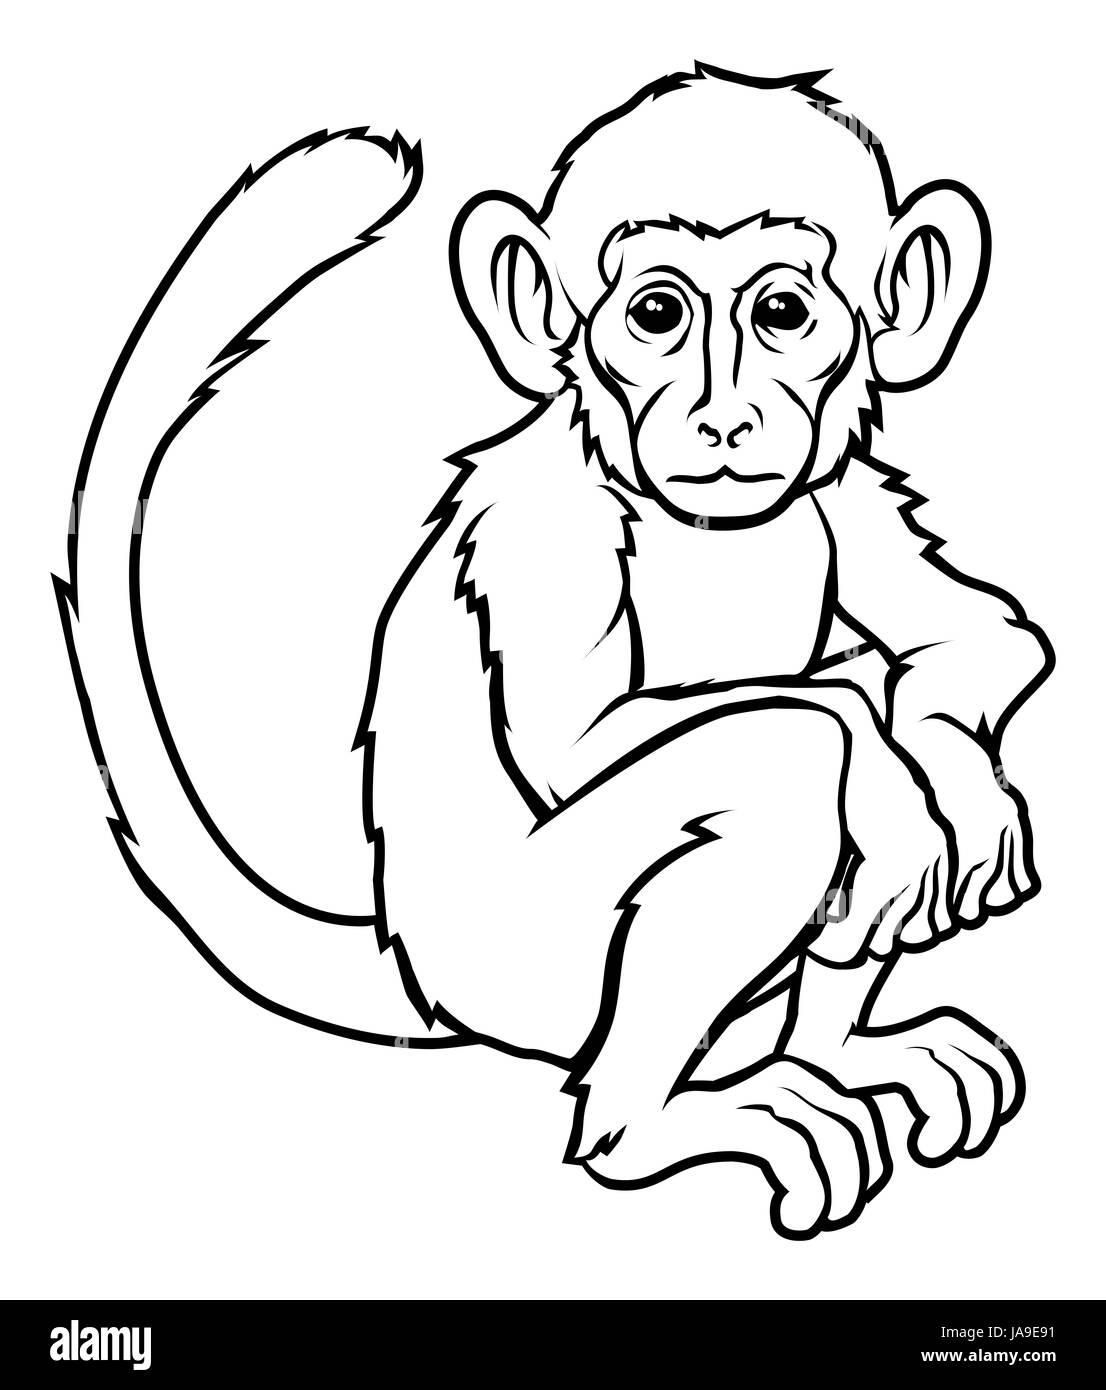 art, birth, childbirth, parturition, delivery, animal, new, monkey, black, - Stock Image